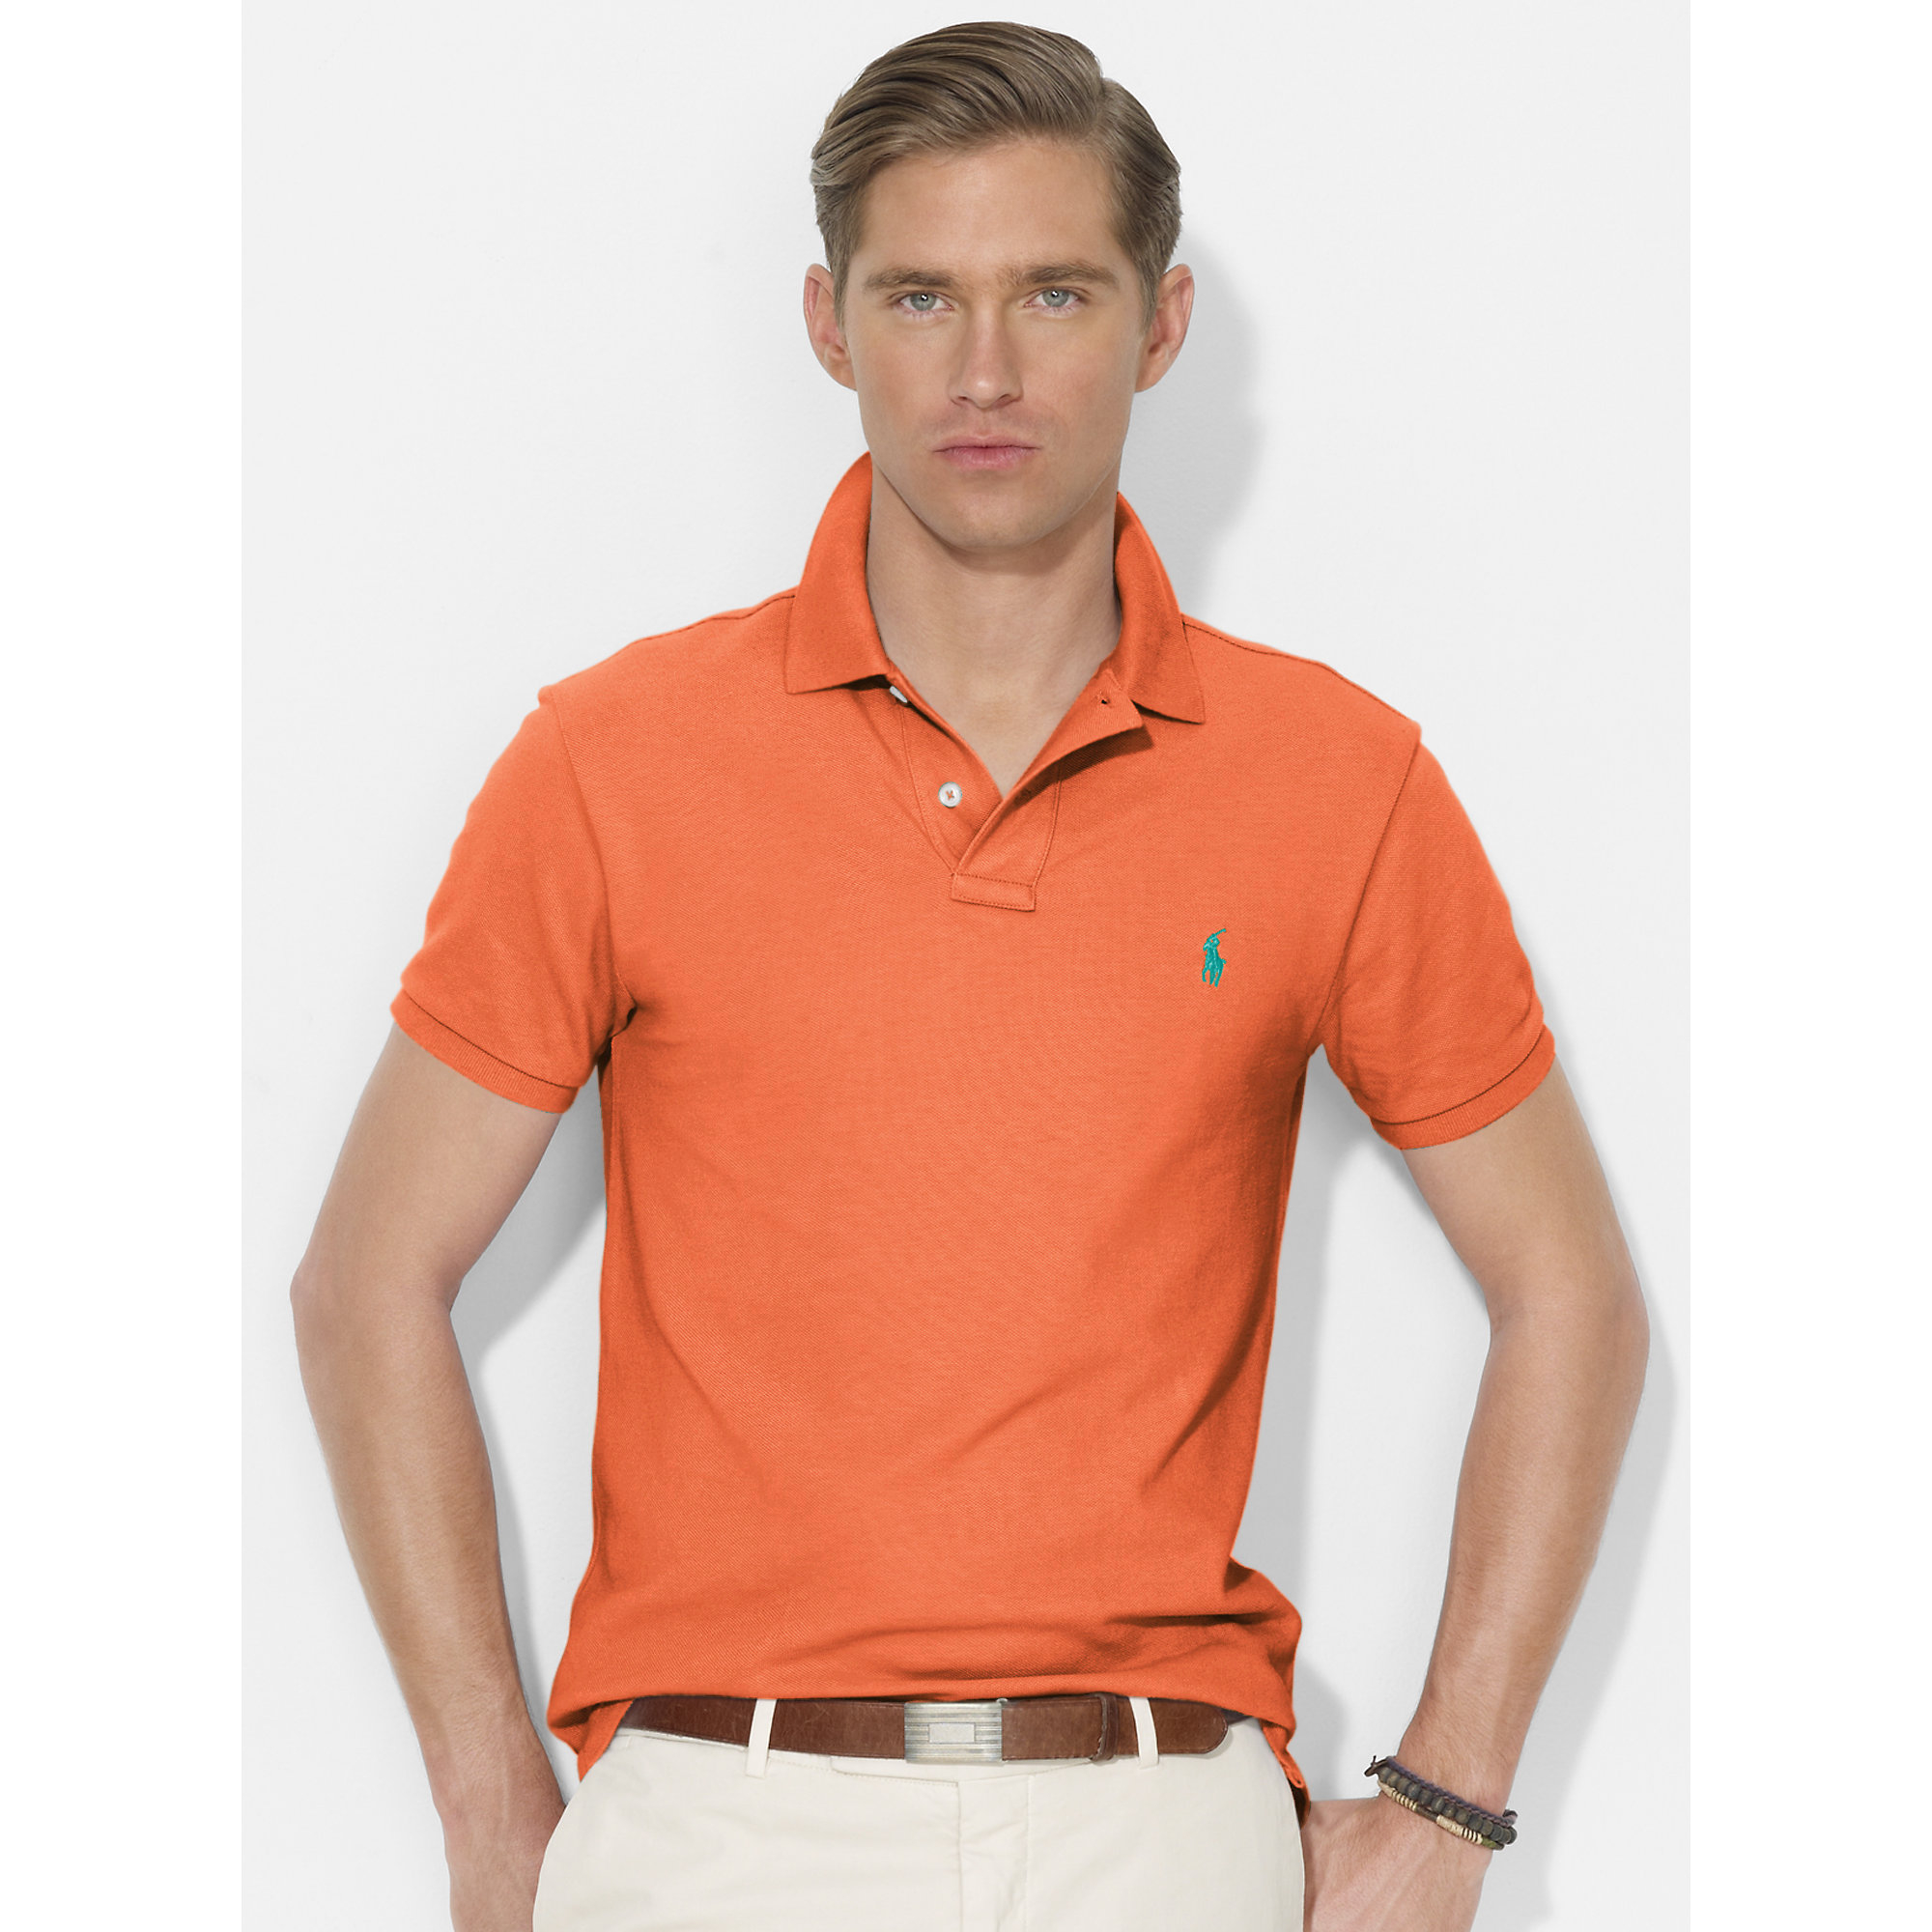 311ec35f ... authentic lyst polo ralph lauren slim fit mesh polo in orange for men  692d1 73952